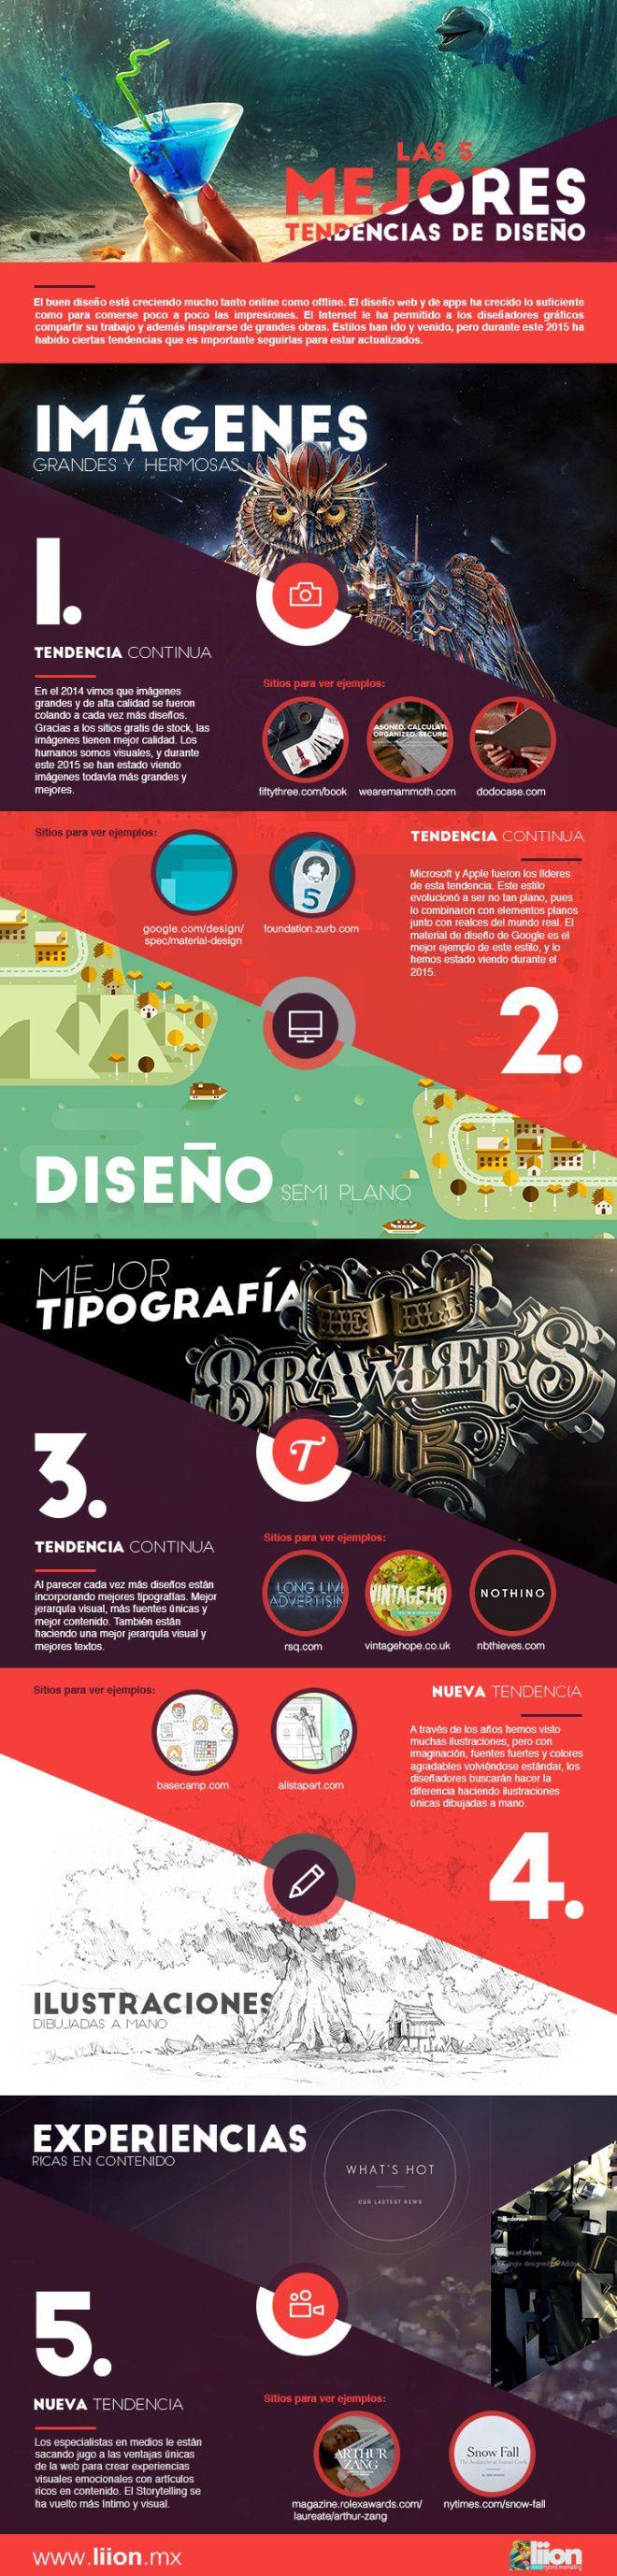 5 mejores tendencias de Diseño infografia infographic